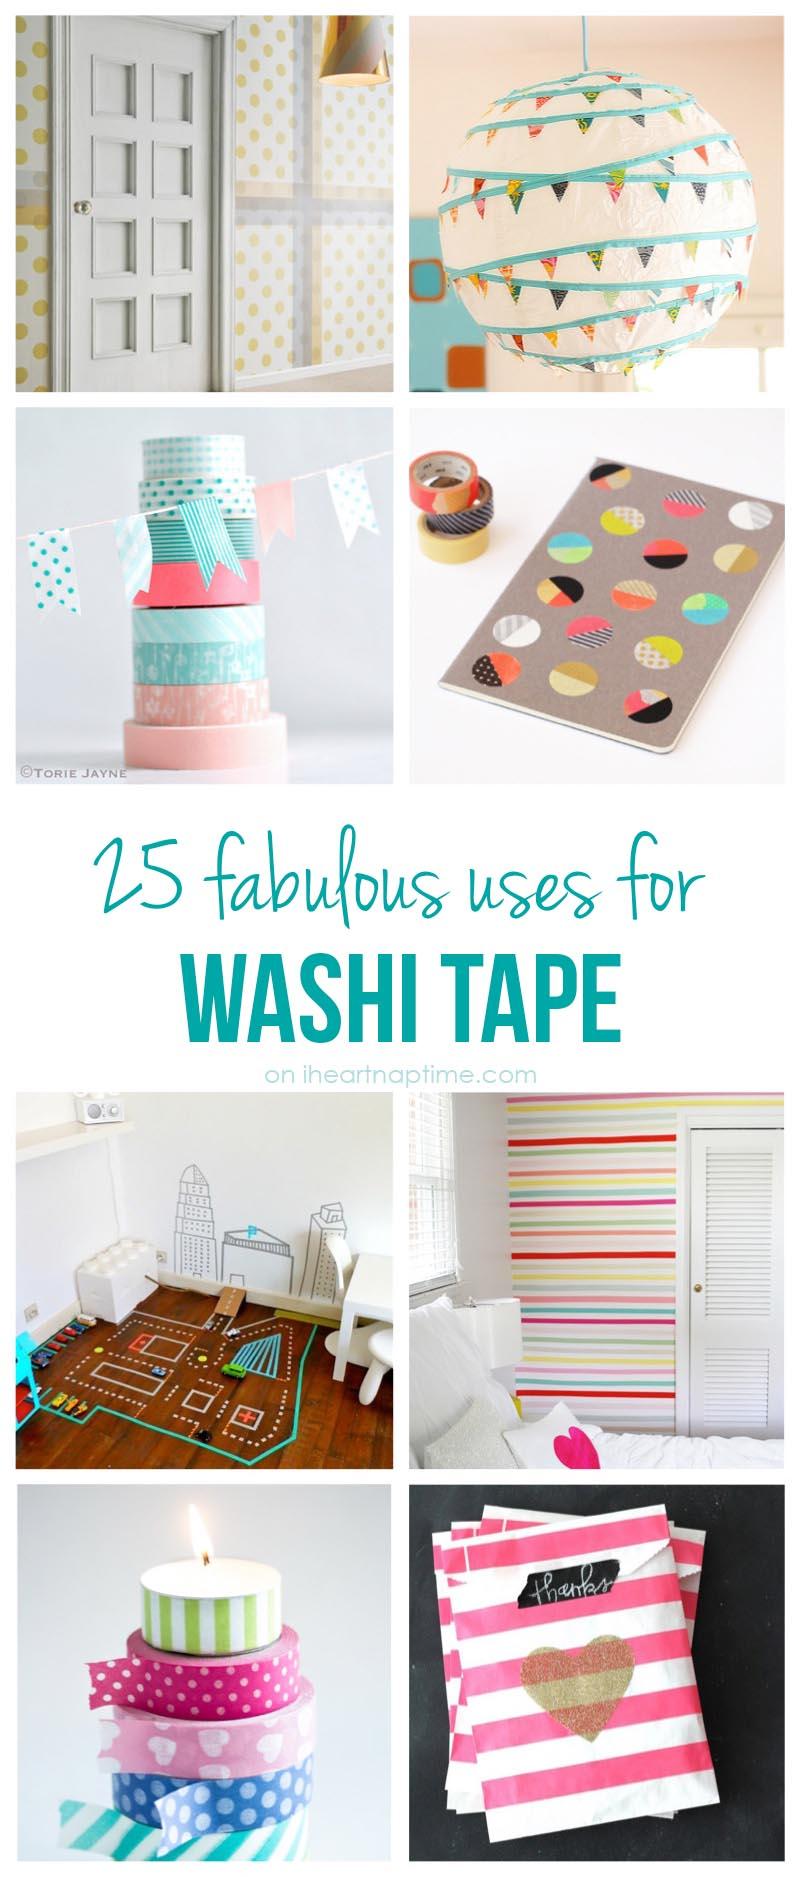 25-fabulous-uses-for-washi-tape